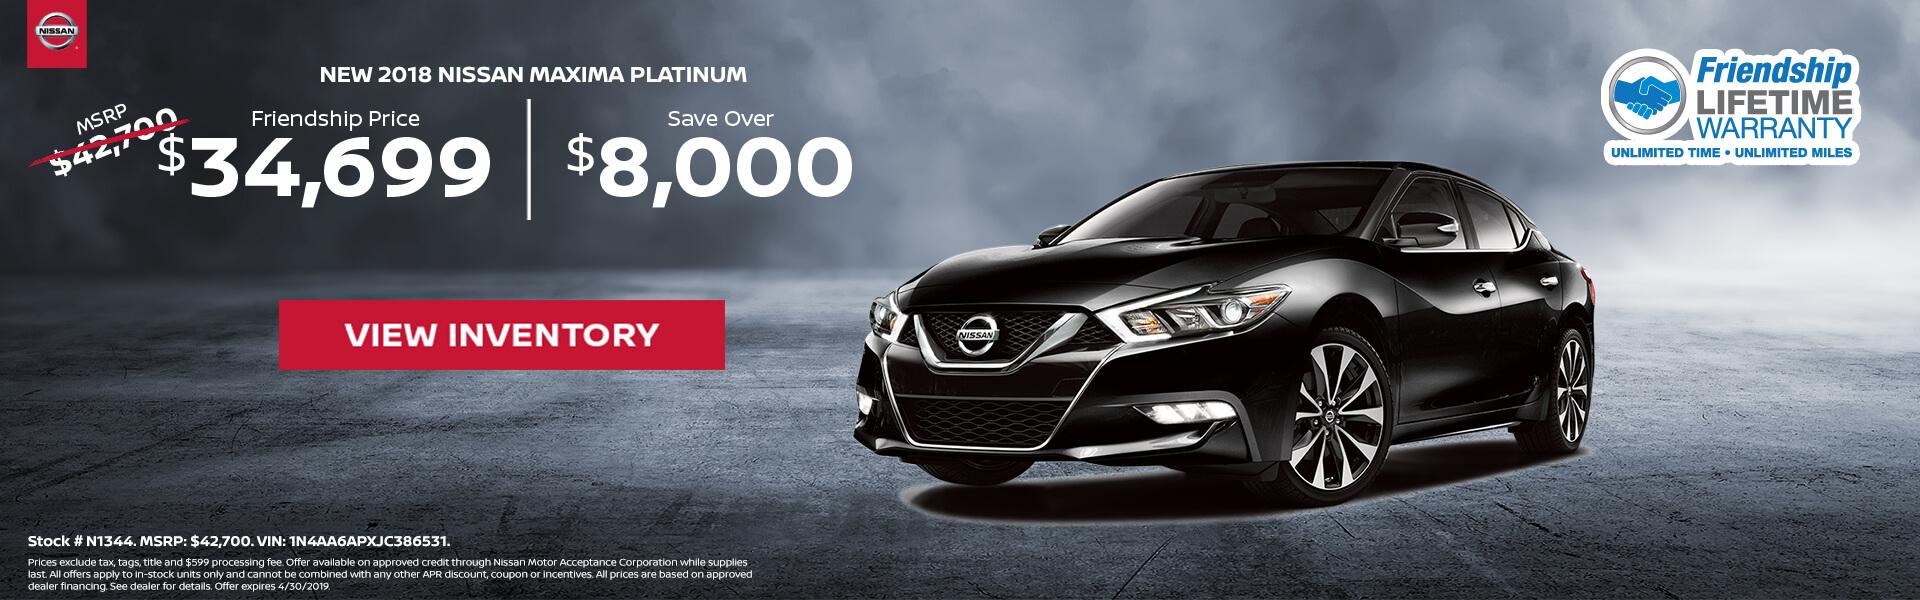 Nissan Maxima $34,699 Purchase